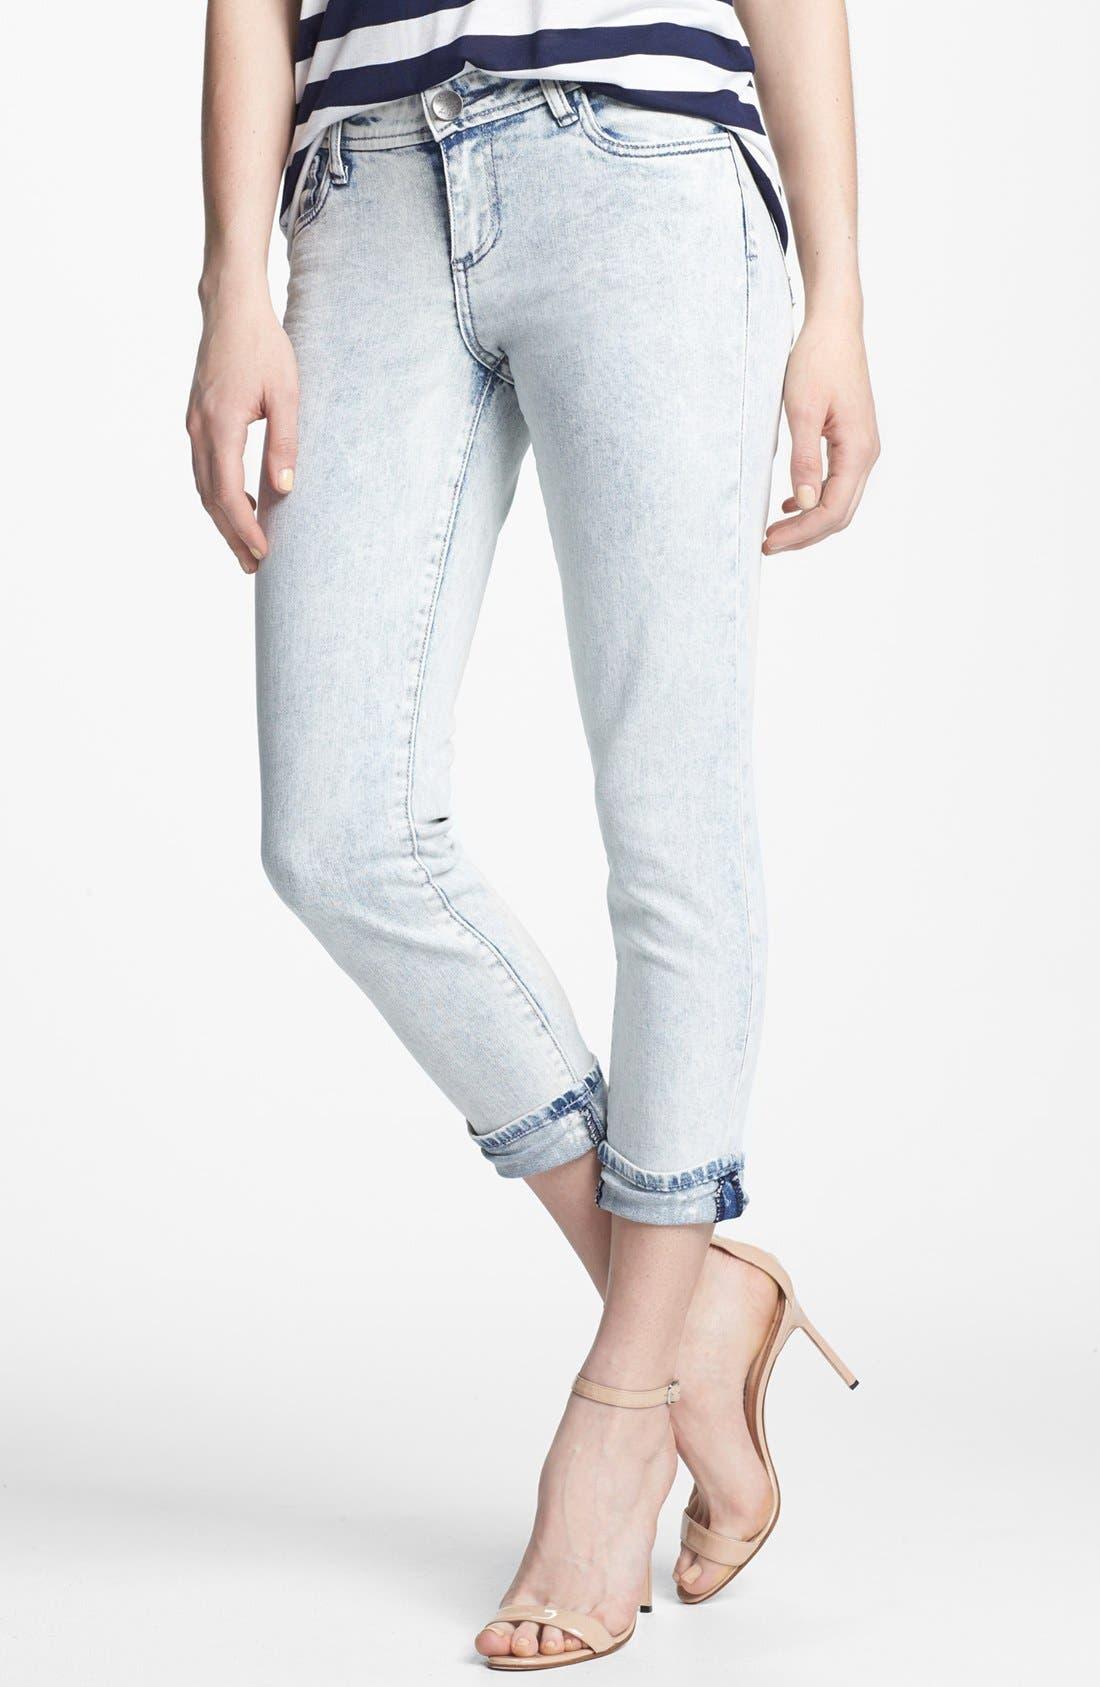 Main Image - KUT from the Kloth 'Catherine' Slim Boyfriend Jeans (Seemly)